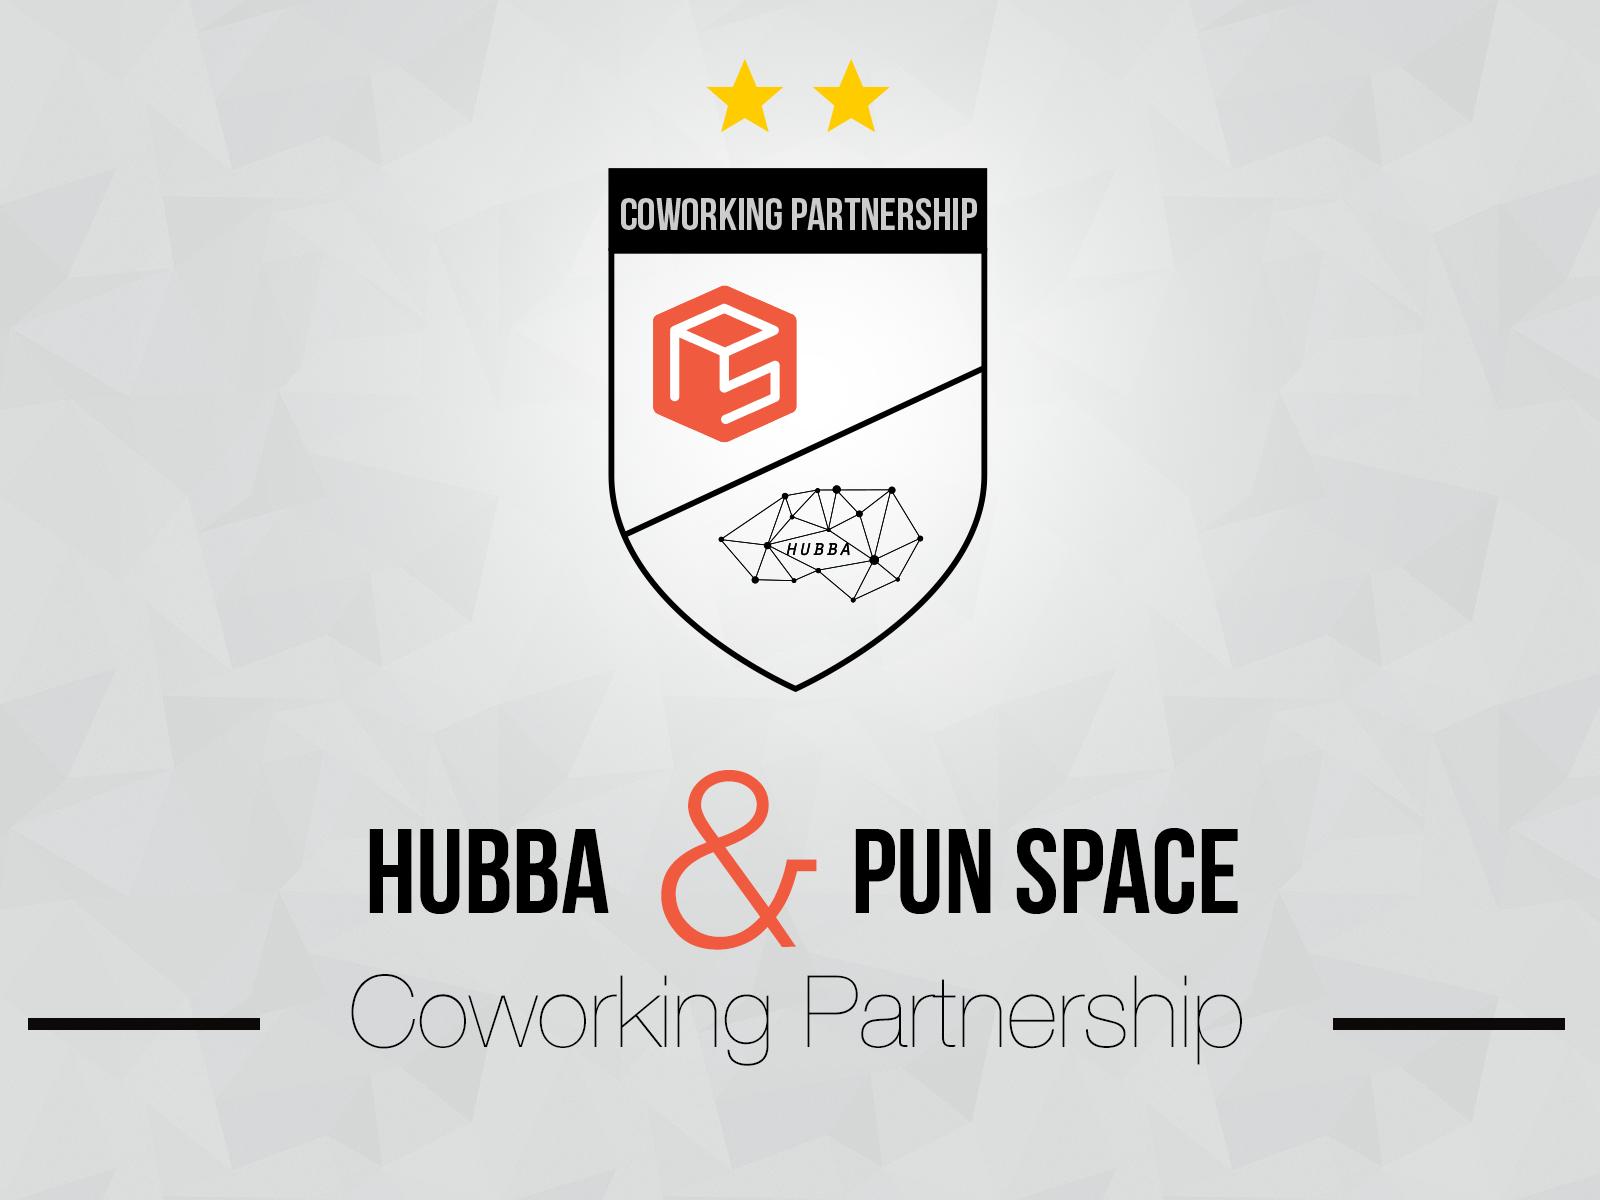 coworking-partnership